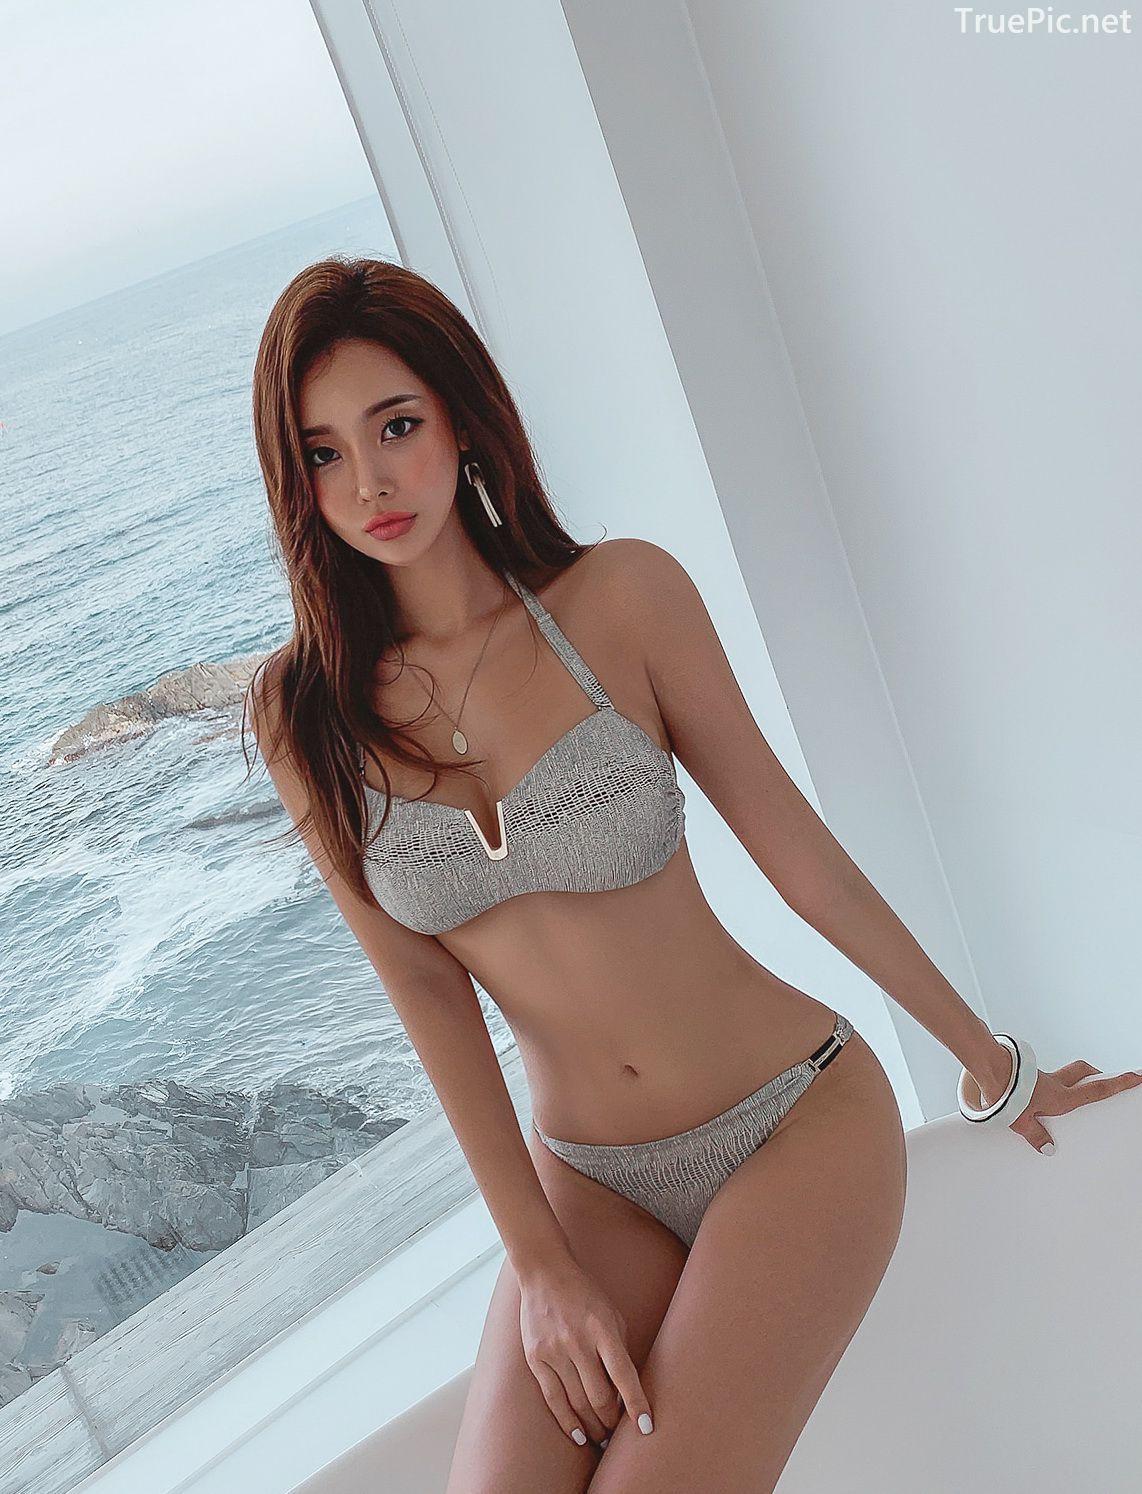 Korean lingerie queen - Park Da Hyun - Chloe python Bikini - Picture 5